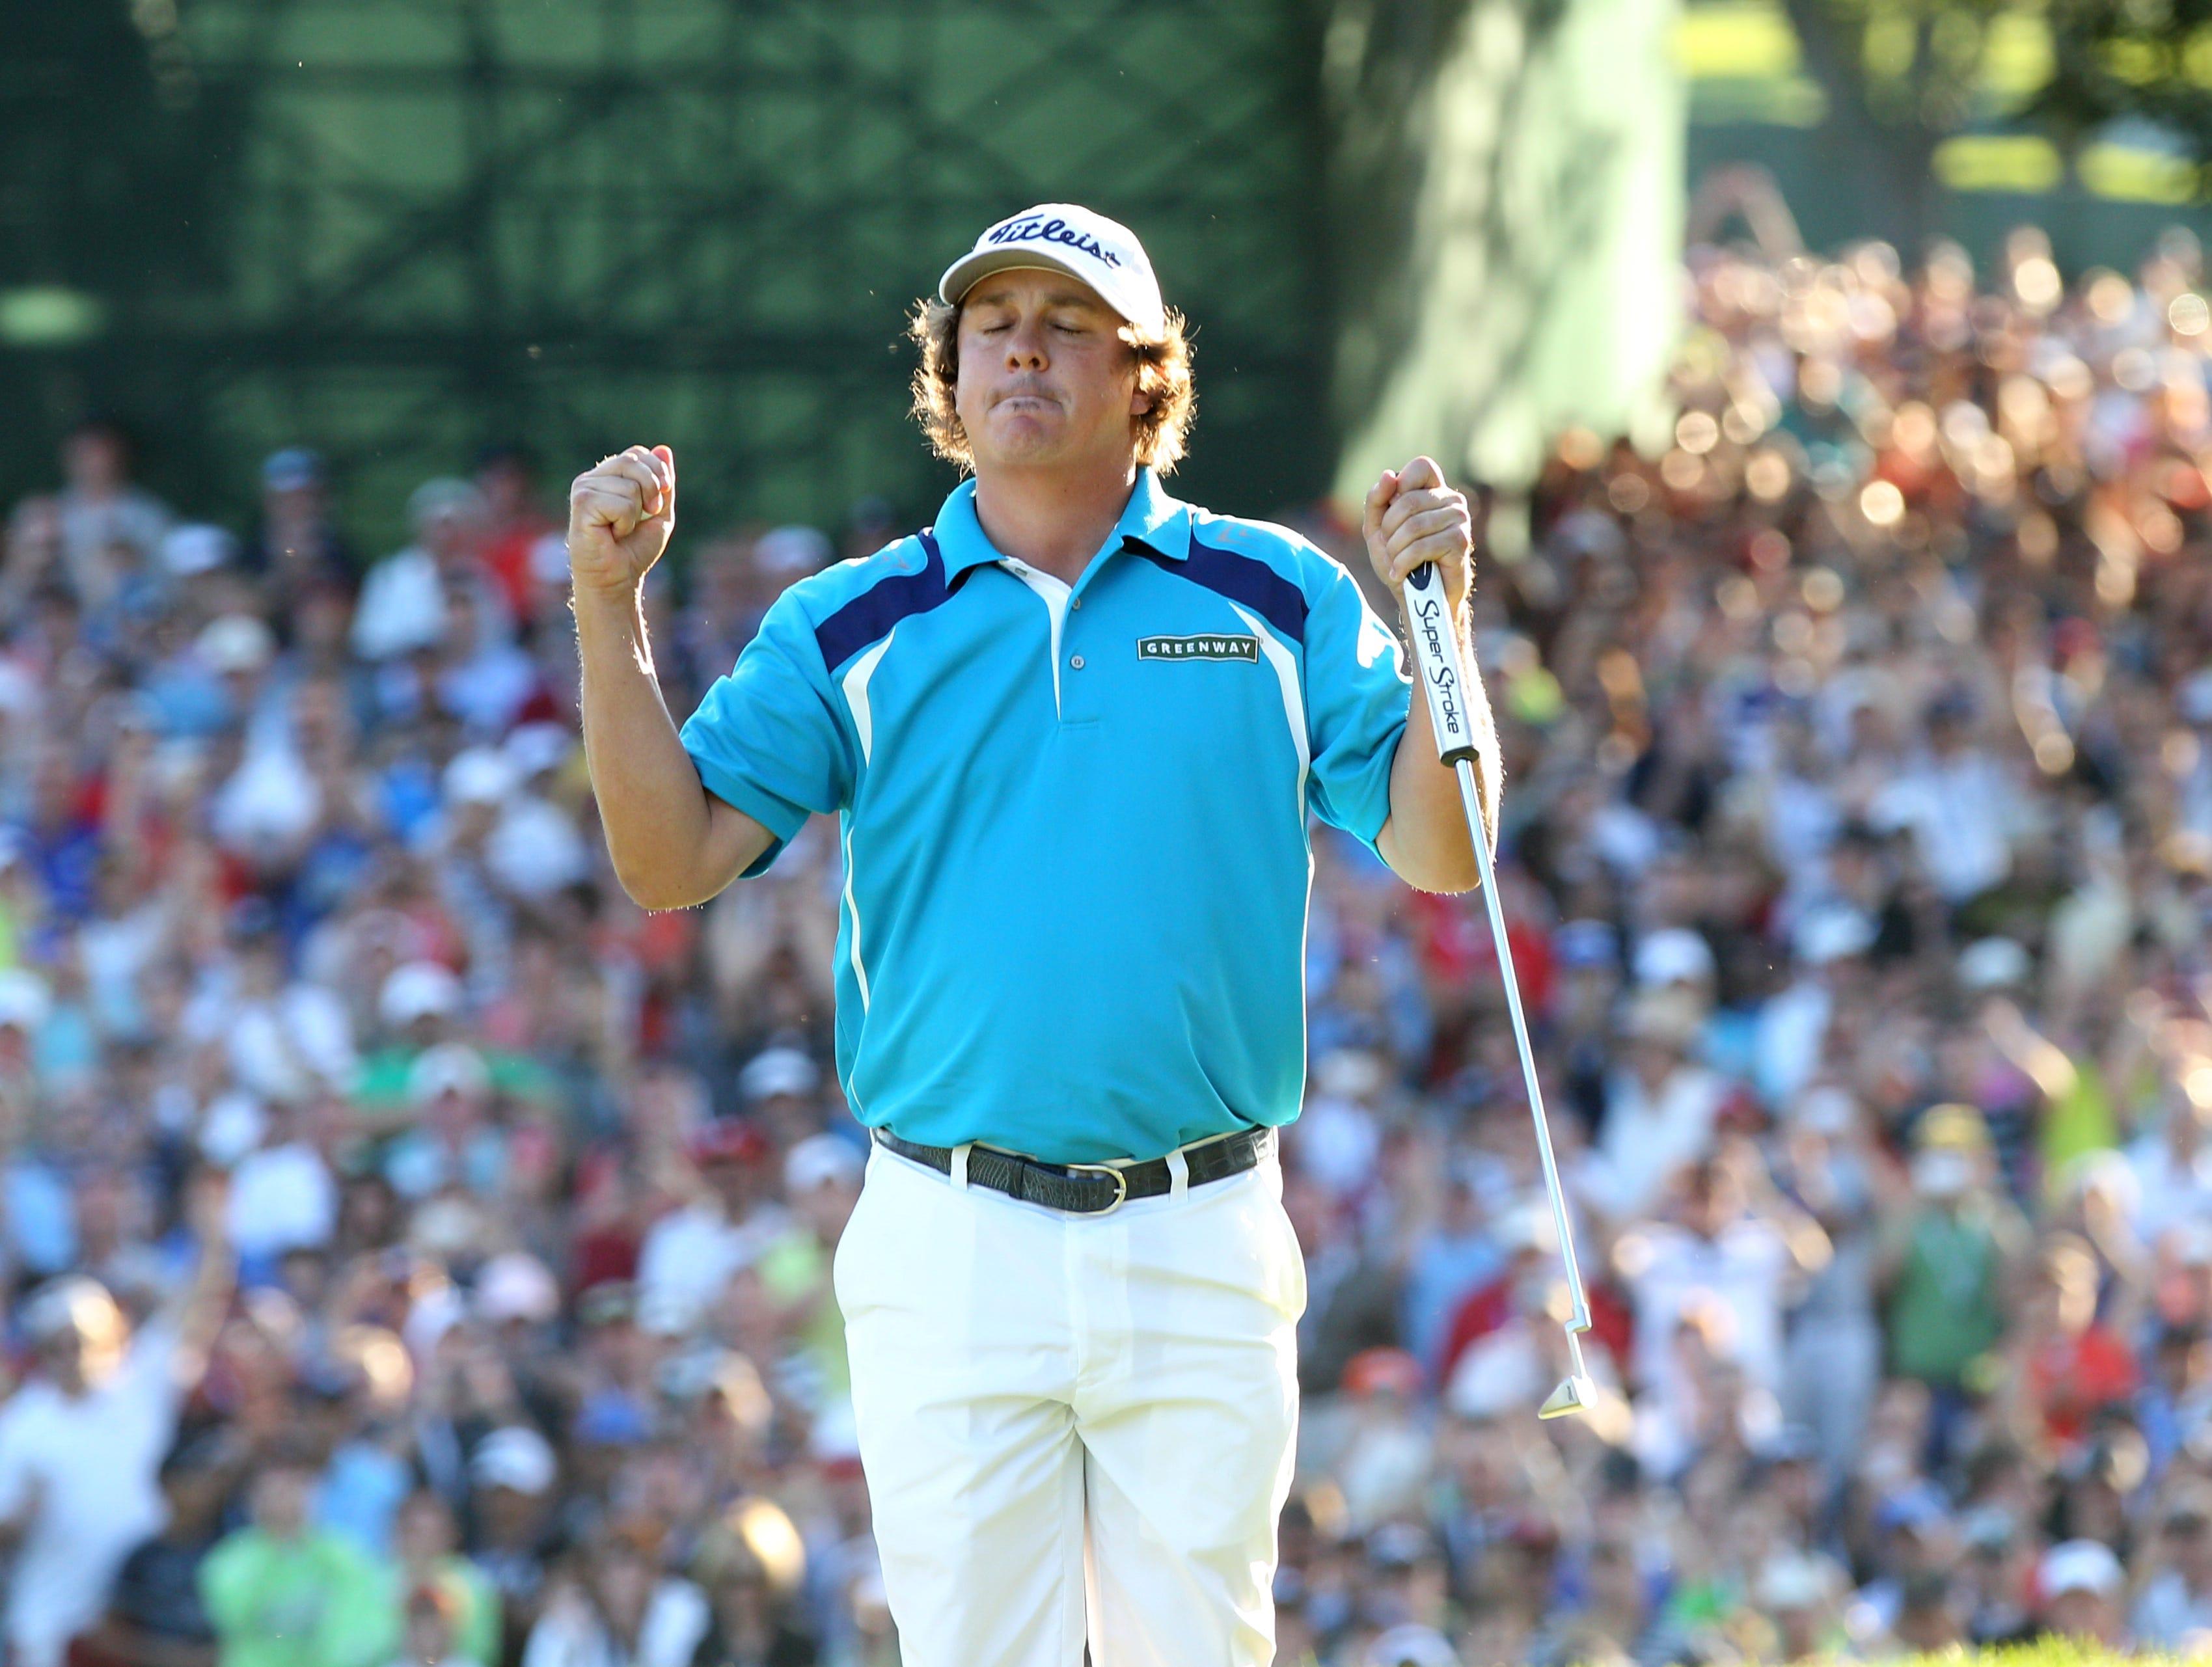 Jason Dufner celebrates his victory at the 95th PGA Championship at Oak Hill Sunday.